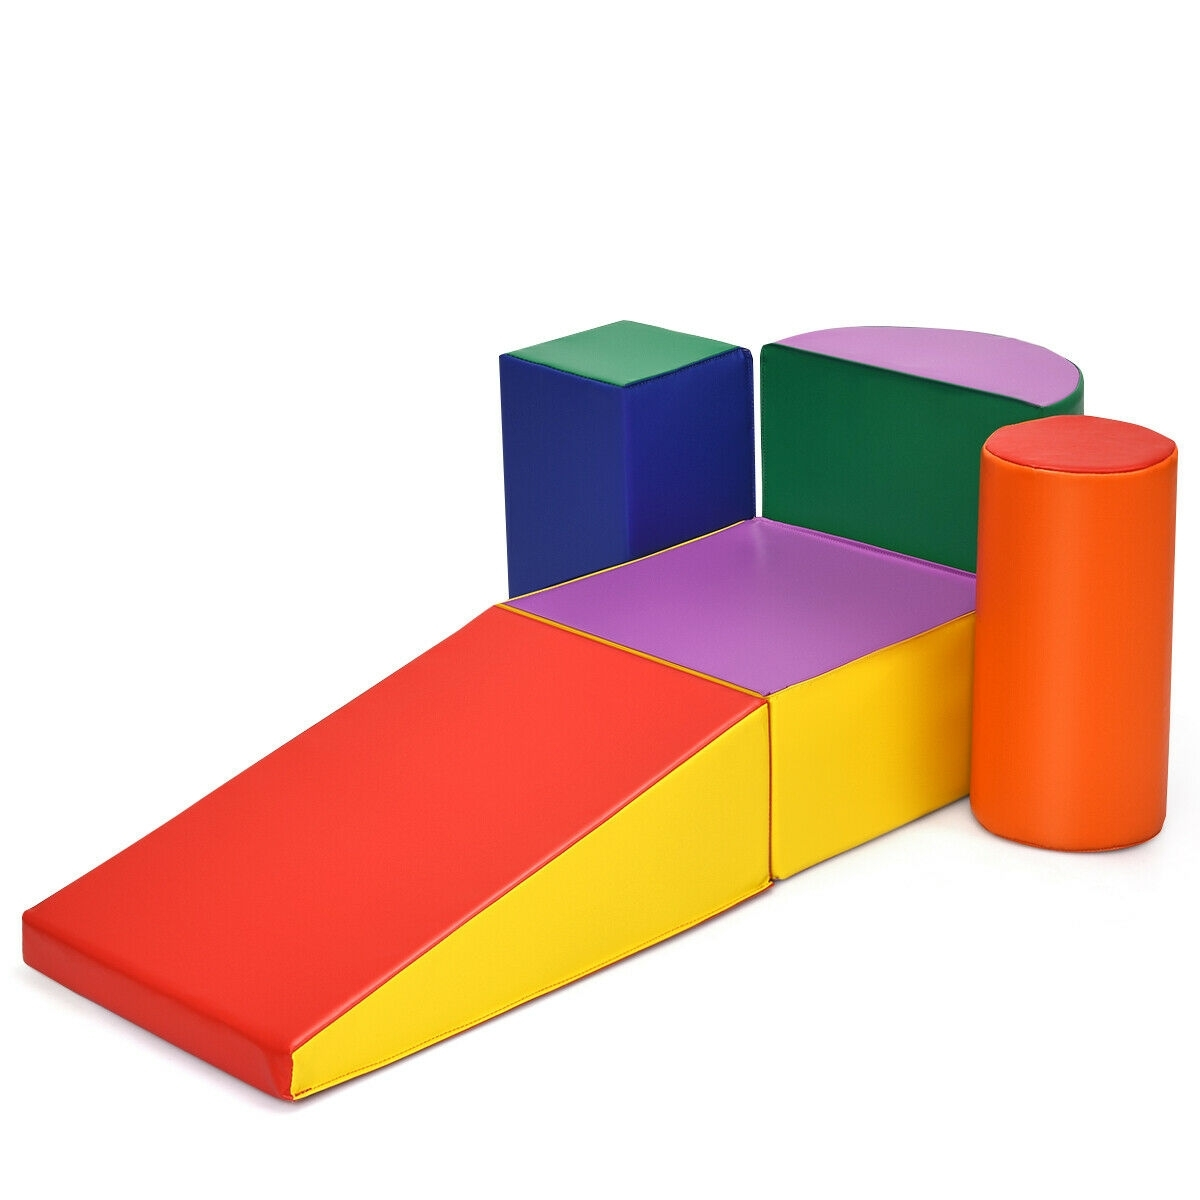 Image of Crawl Climb Foam Shapes Playset Softzone Toy